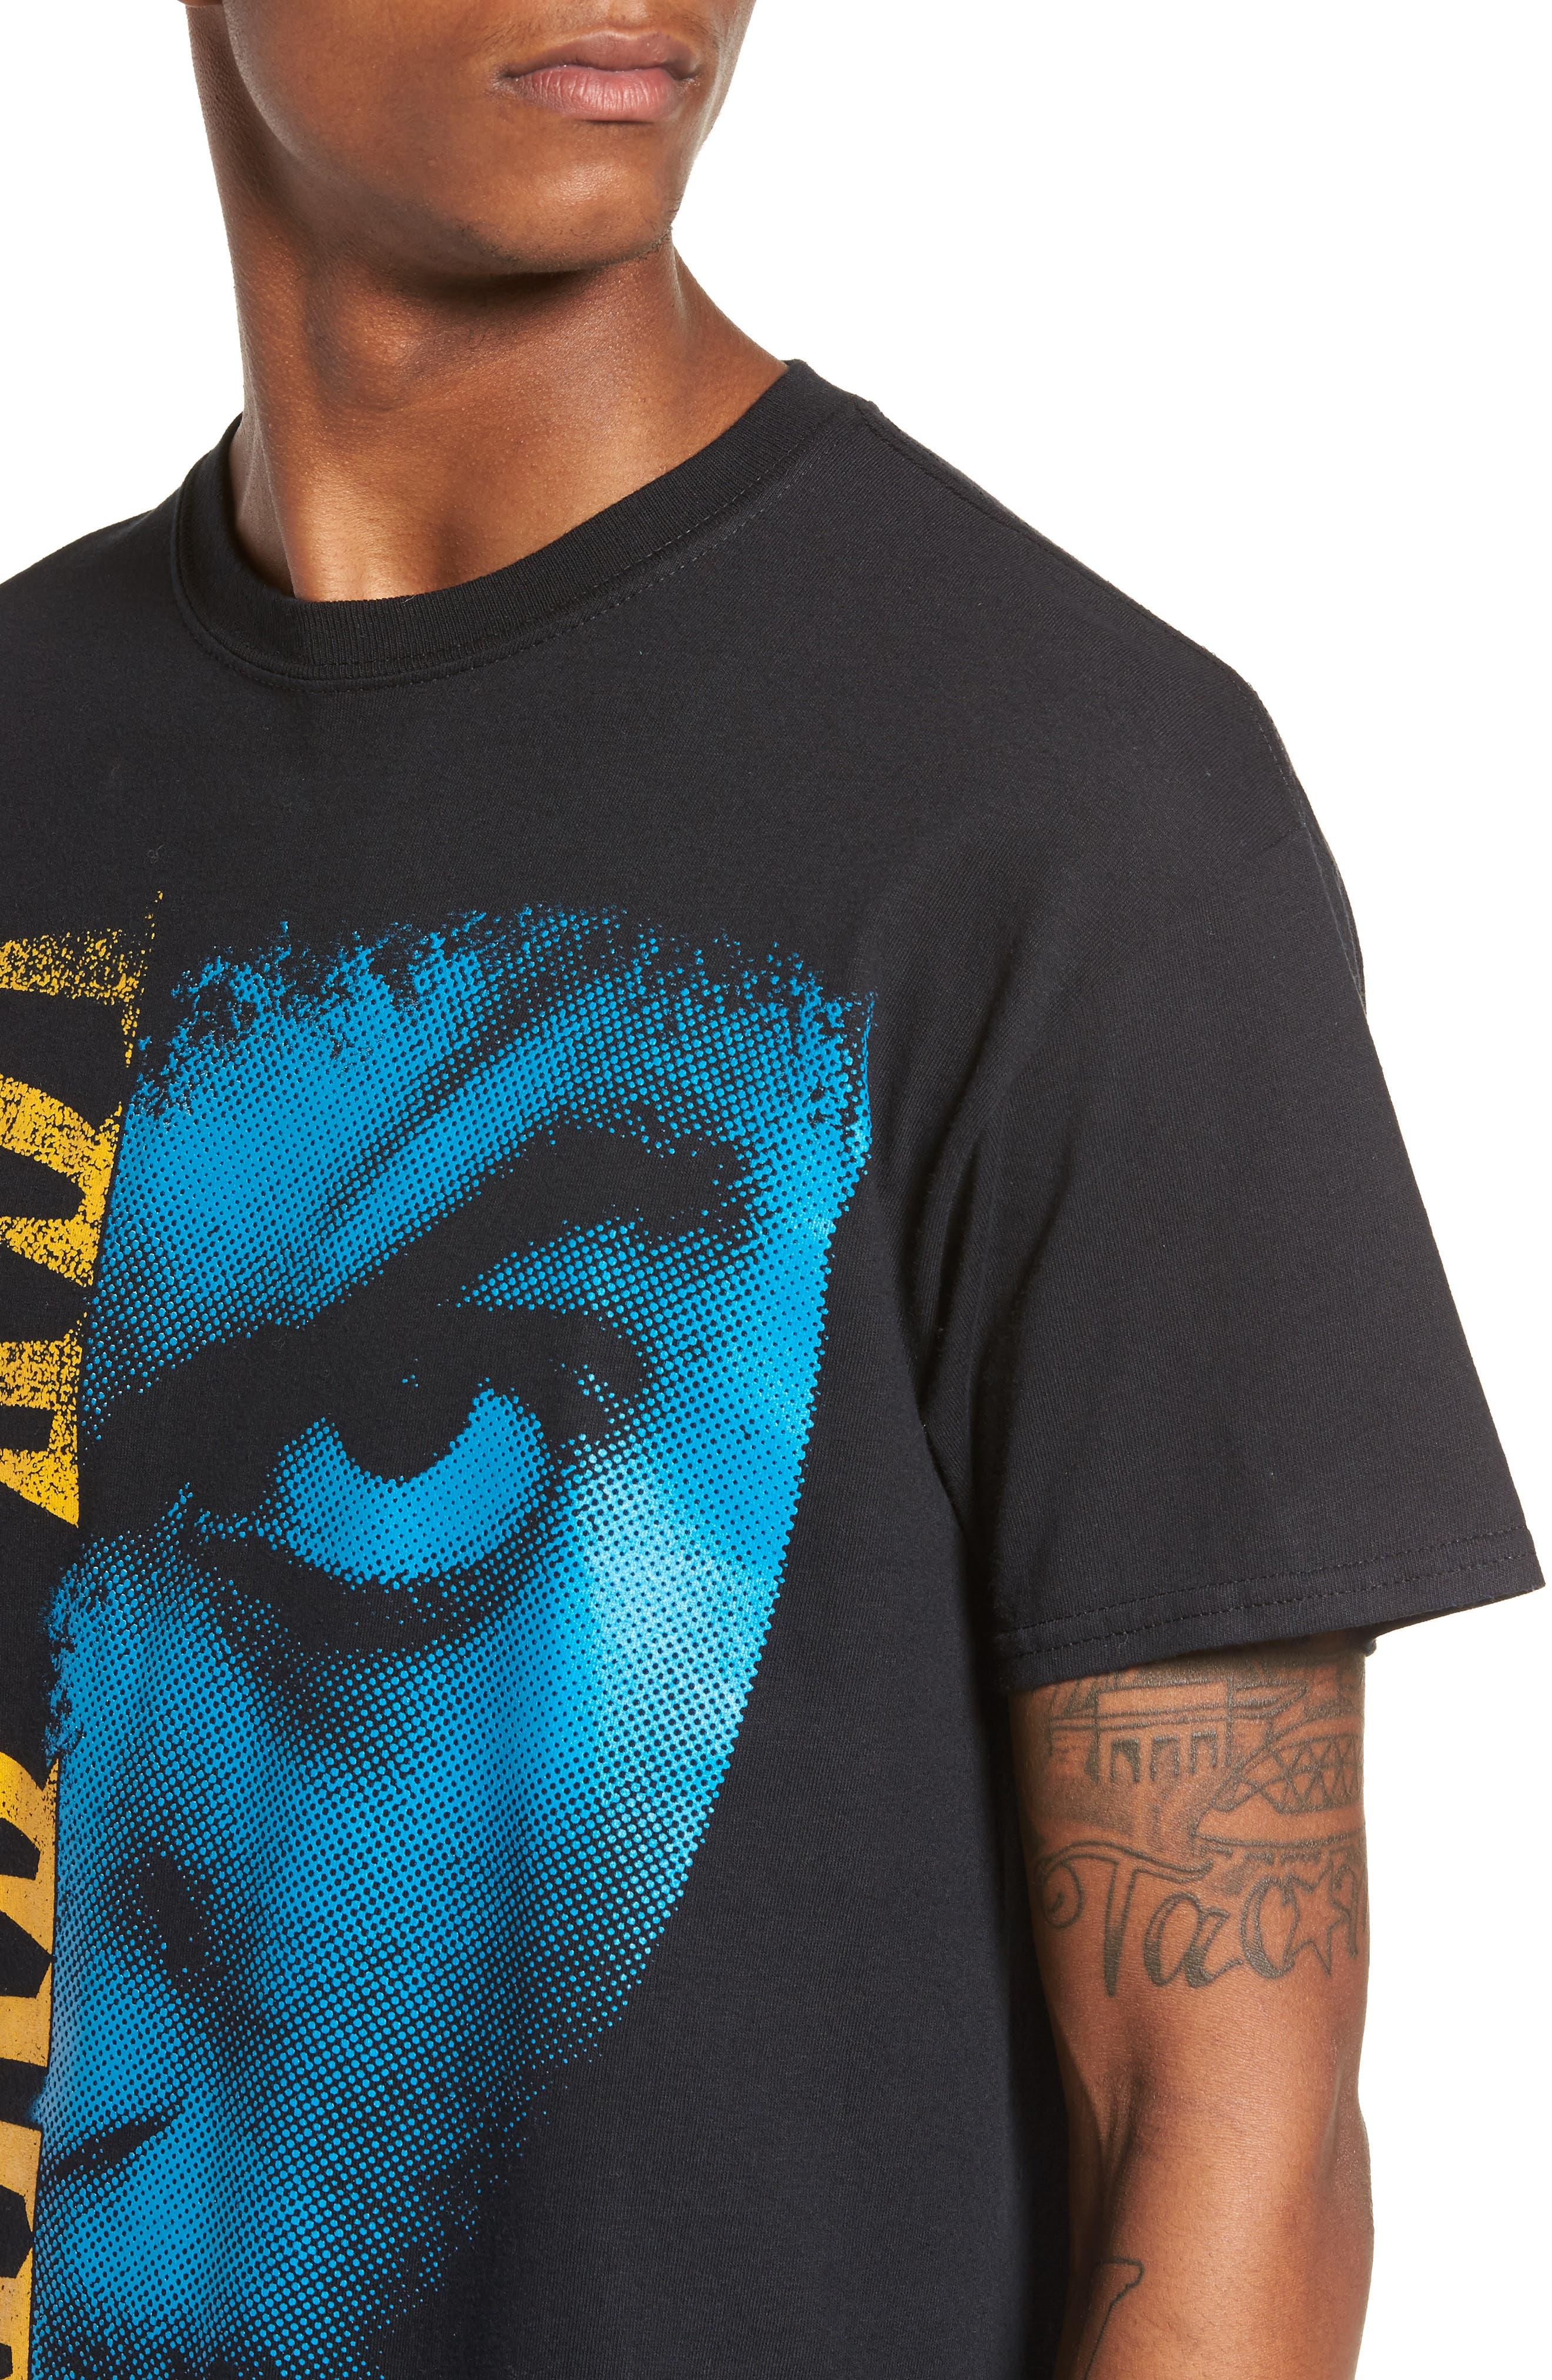 Ice Cube T-Shirt,                             Alternate thumbnail 4, color,                             001